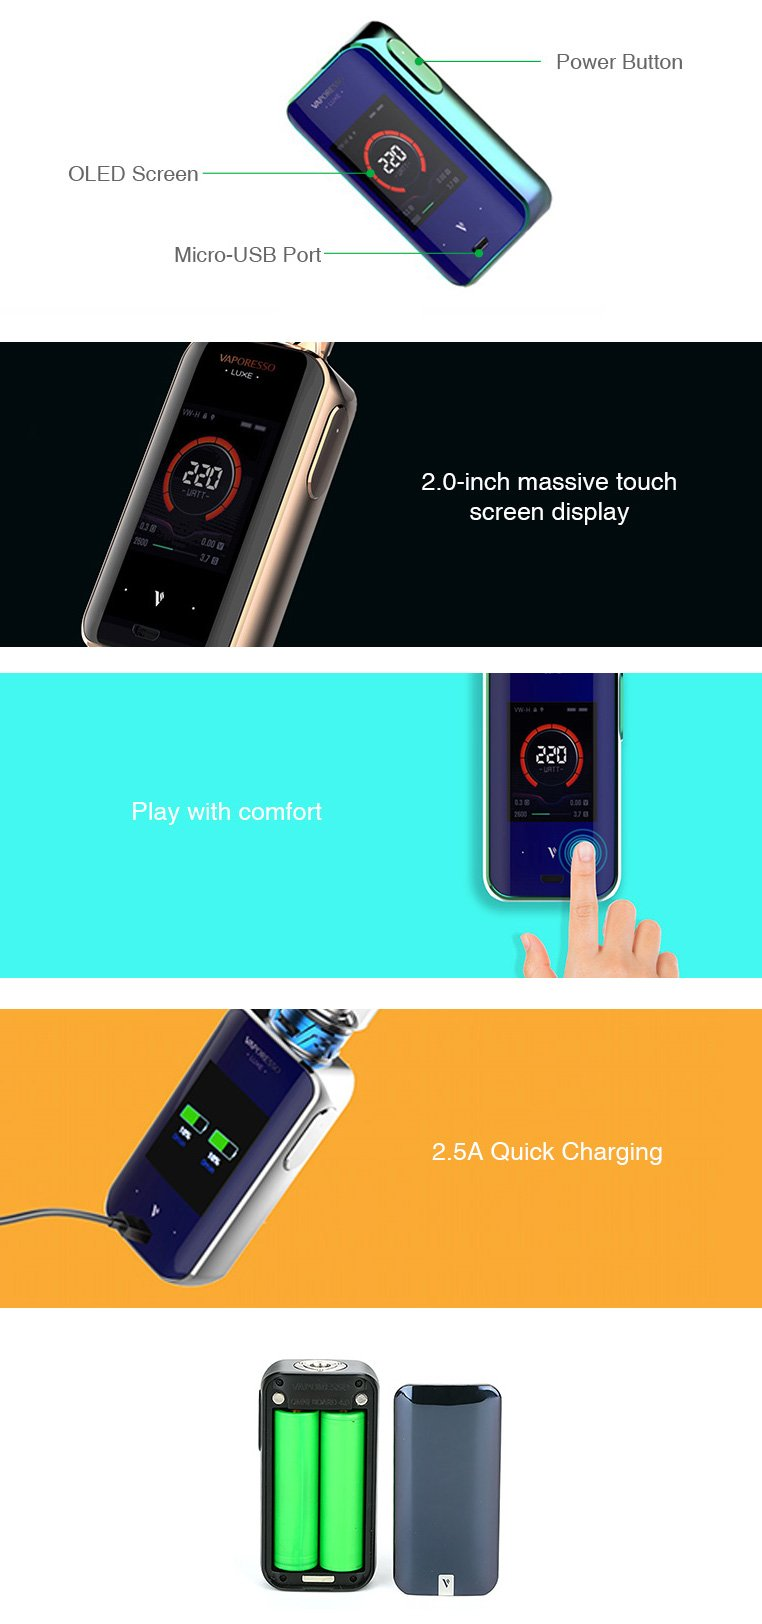 vaporesso-luxe-220w-touch-screen-tc-box-mod